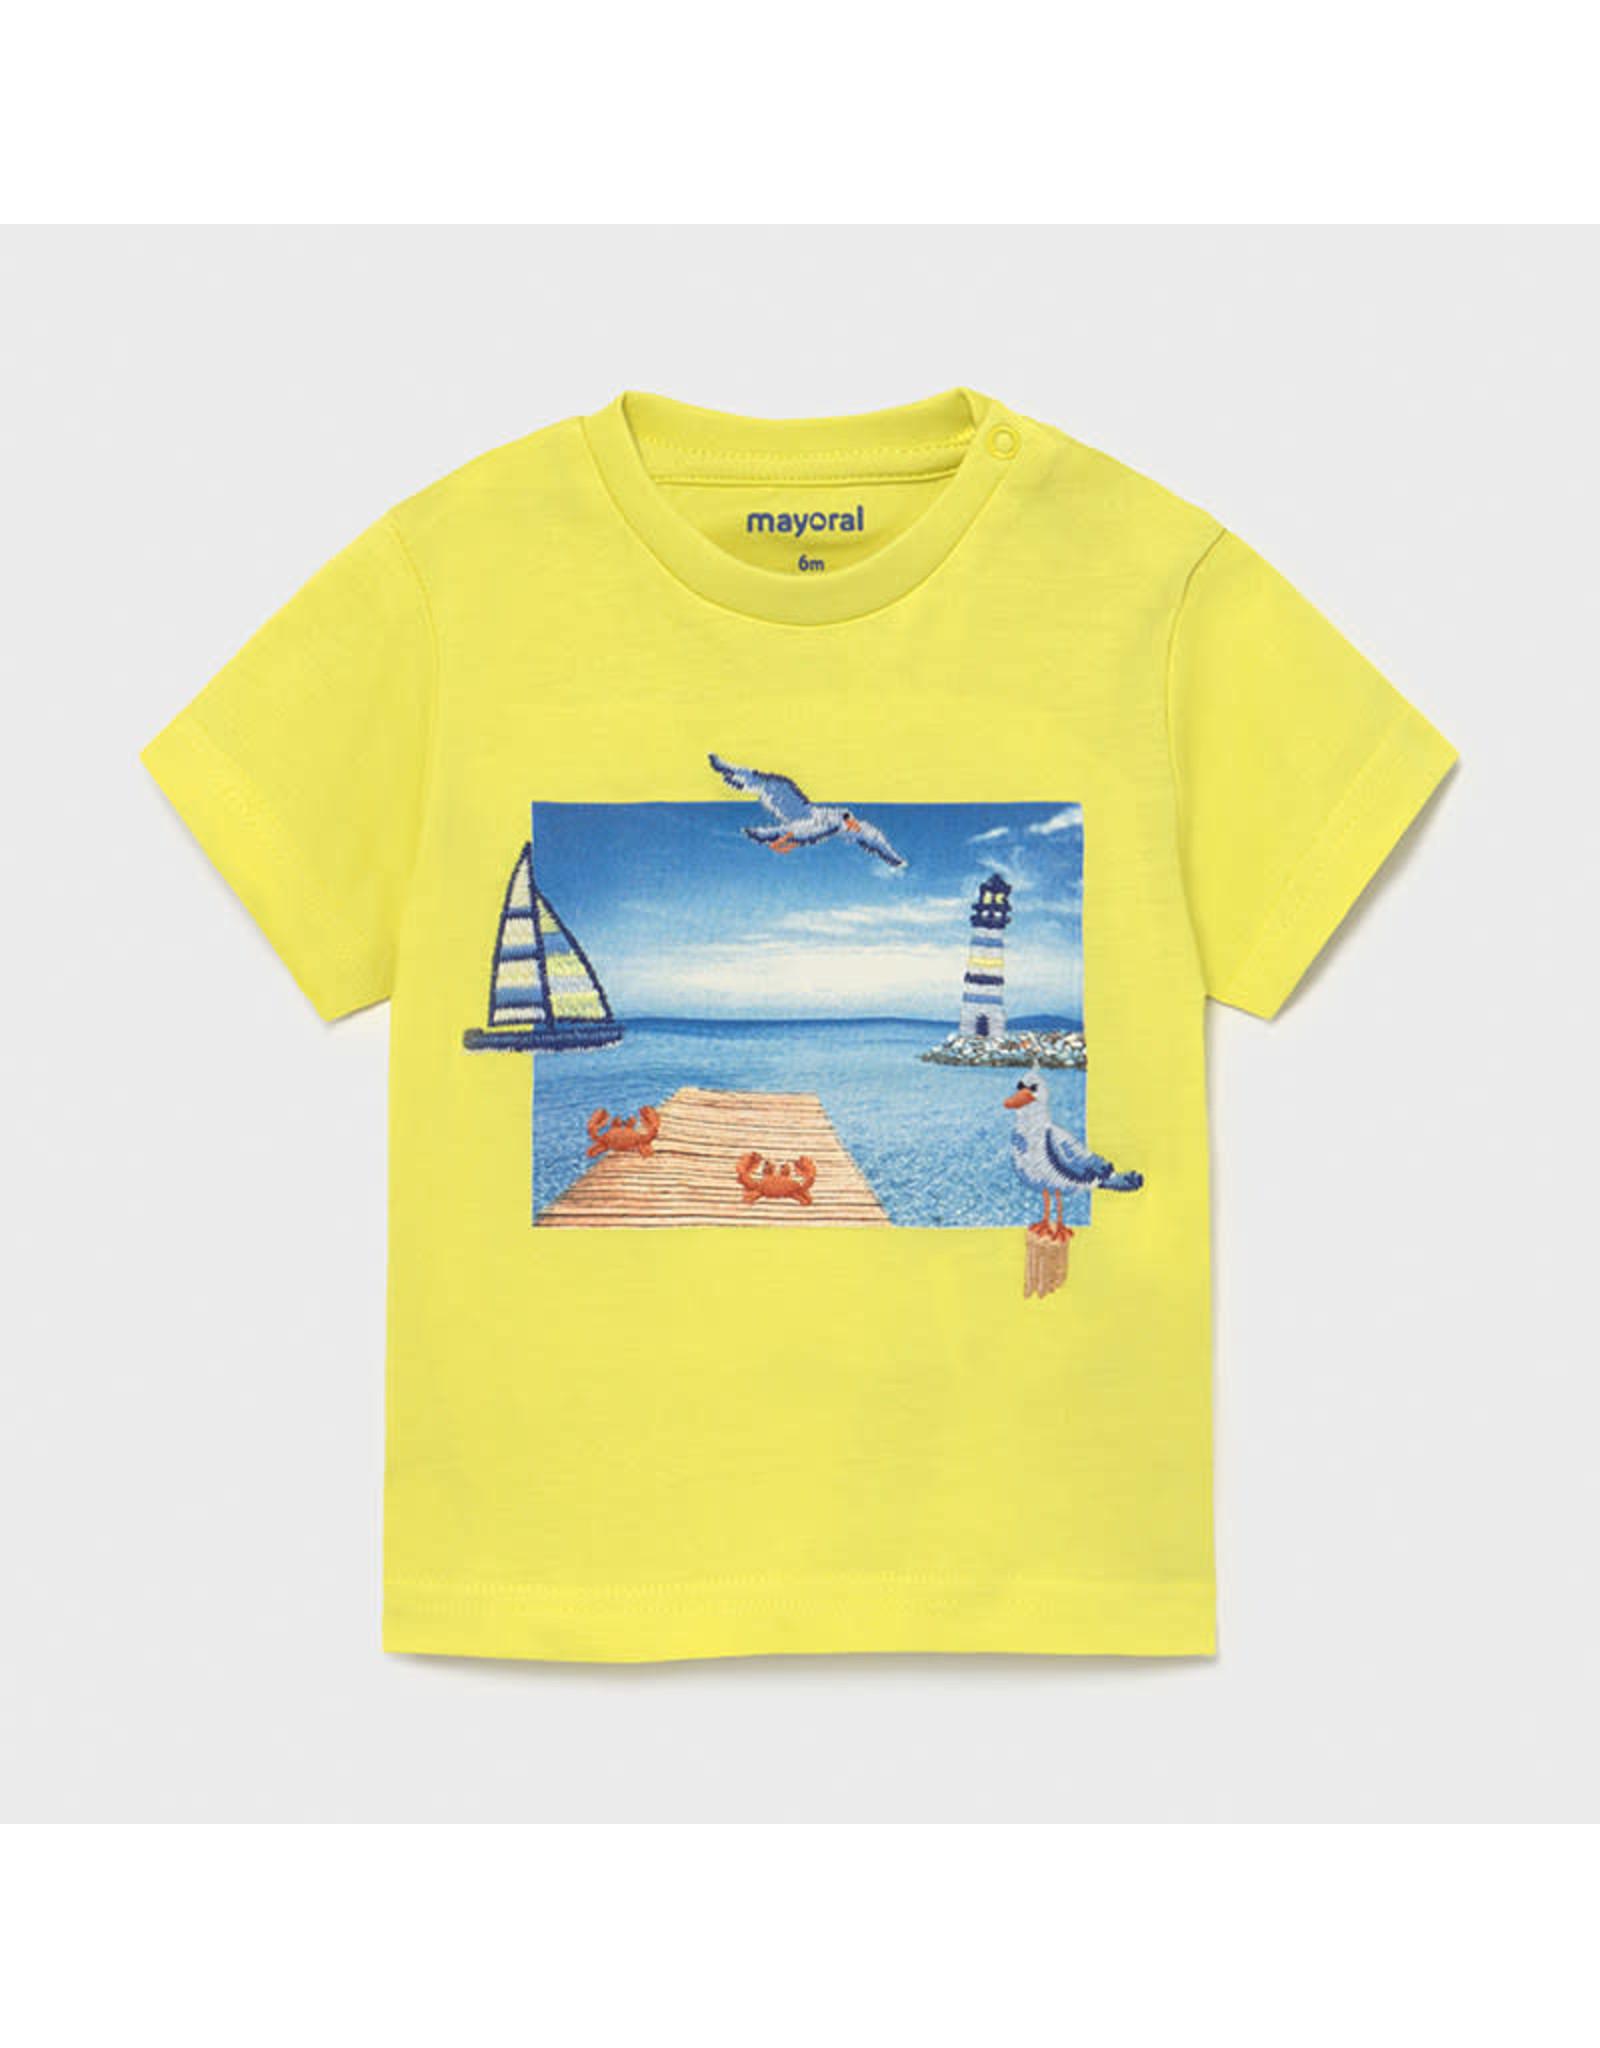 Mayoral Short Sleeve T-Shirt - Boys